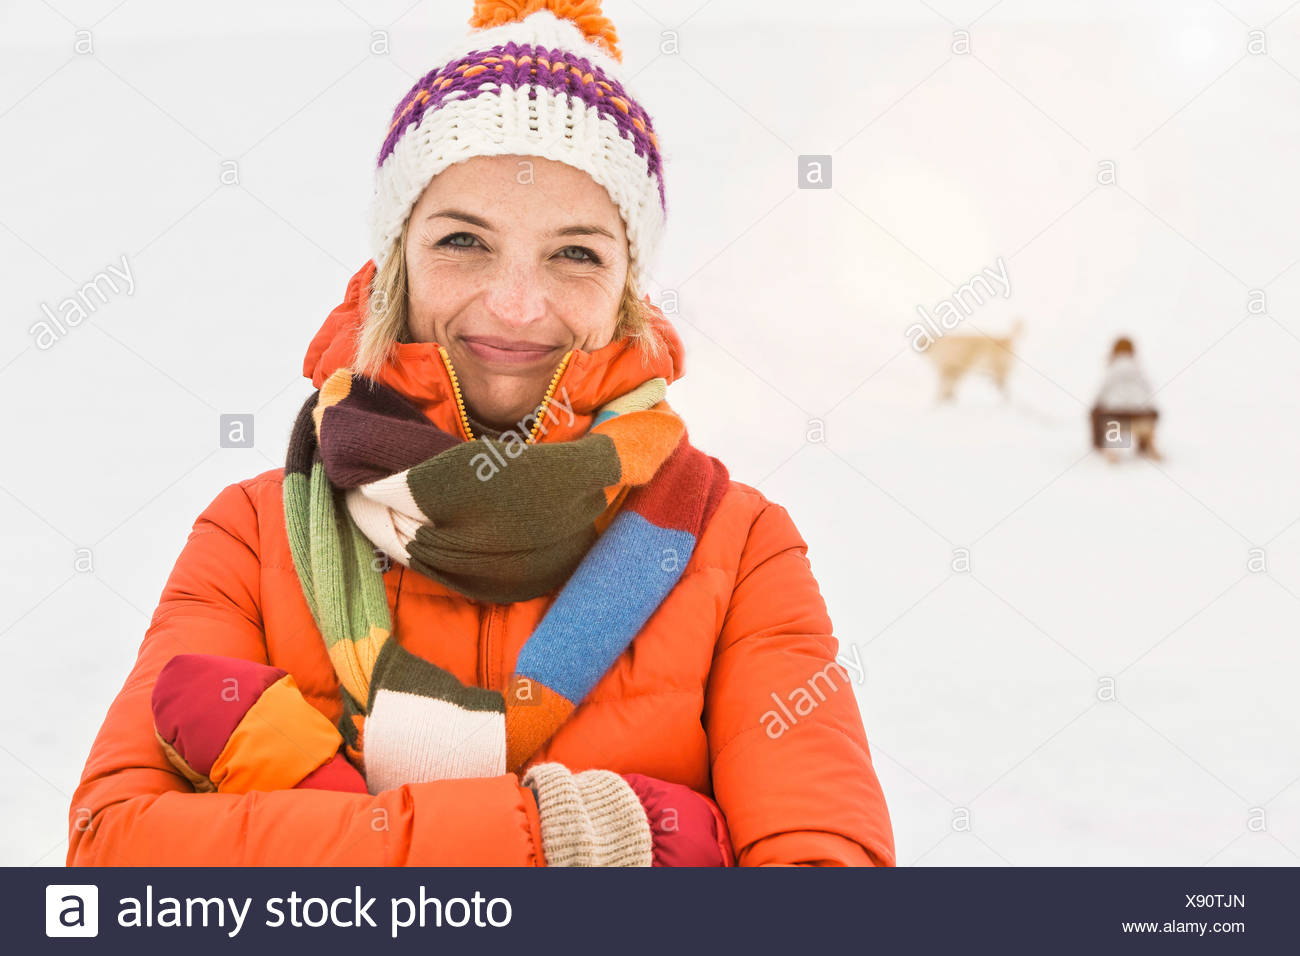 Woman wearing Knit hat et foulard rayé Photo Stock